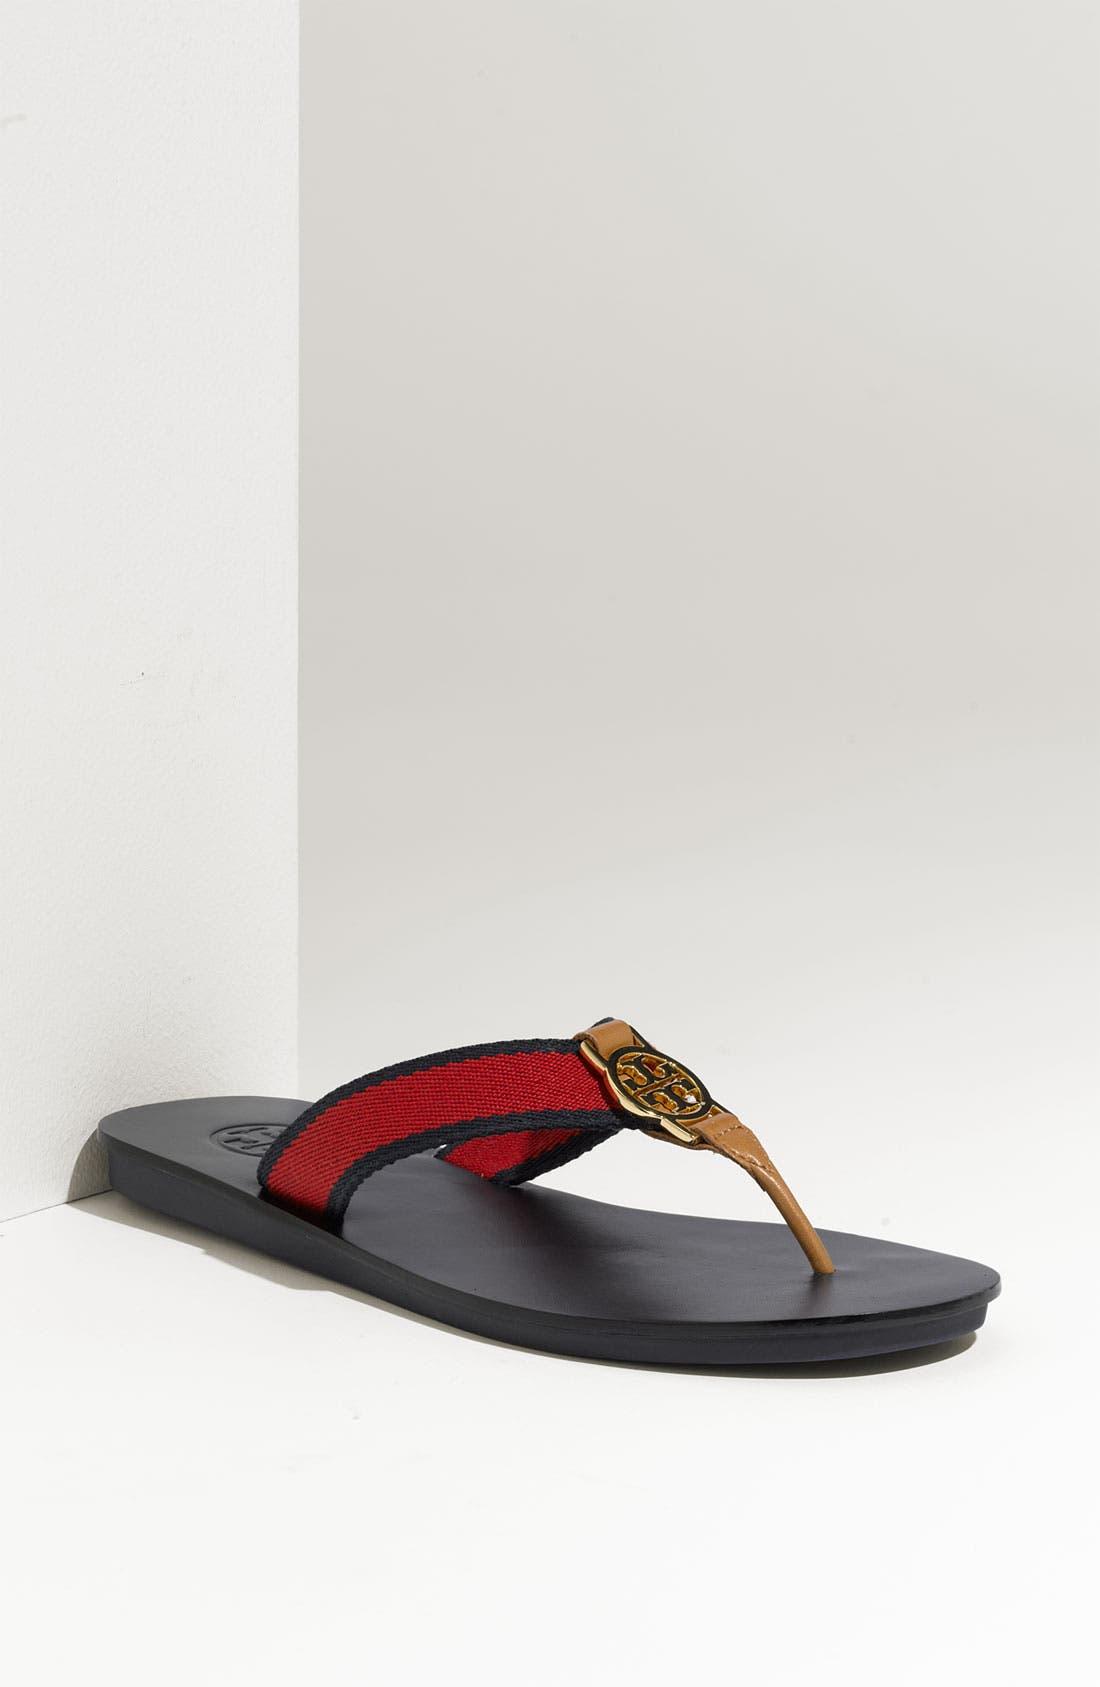 Main Image - Tory Burch 'Lise' Thong Sandal